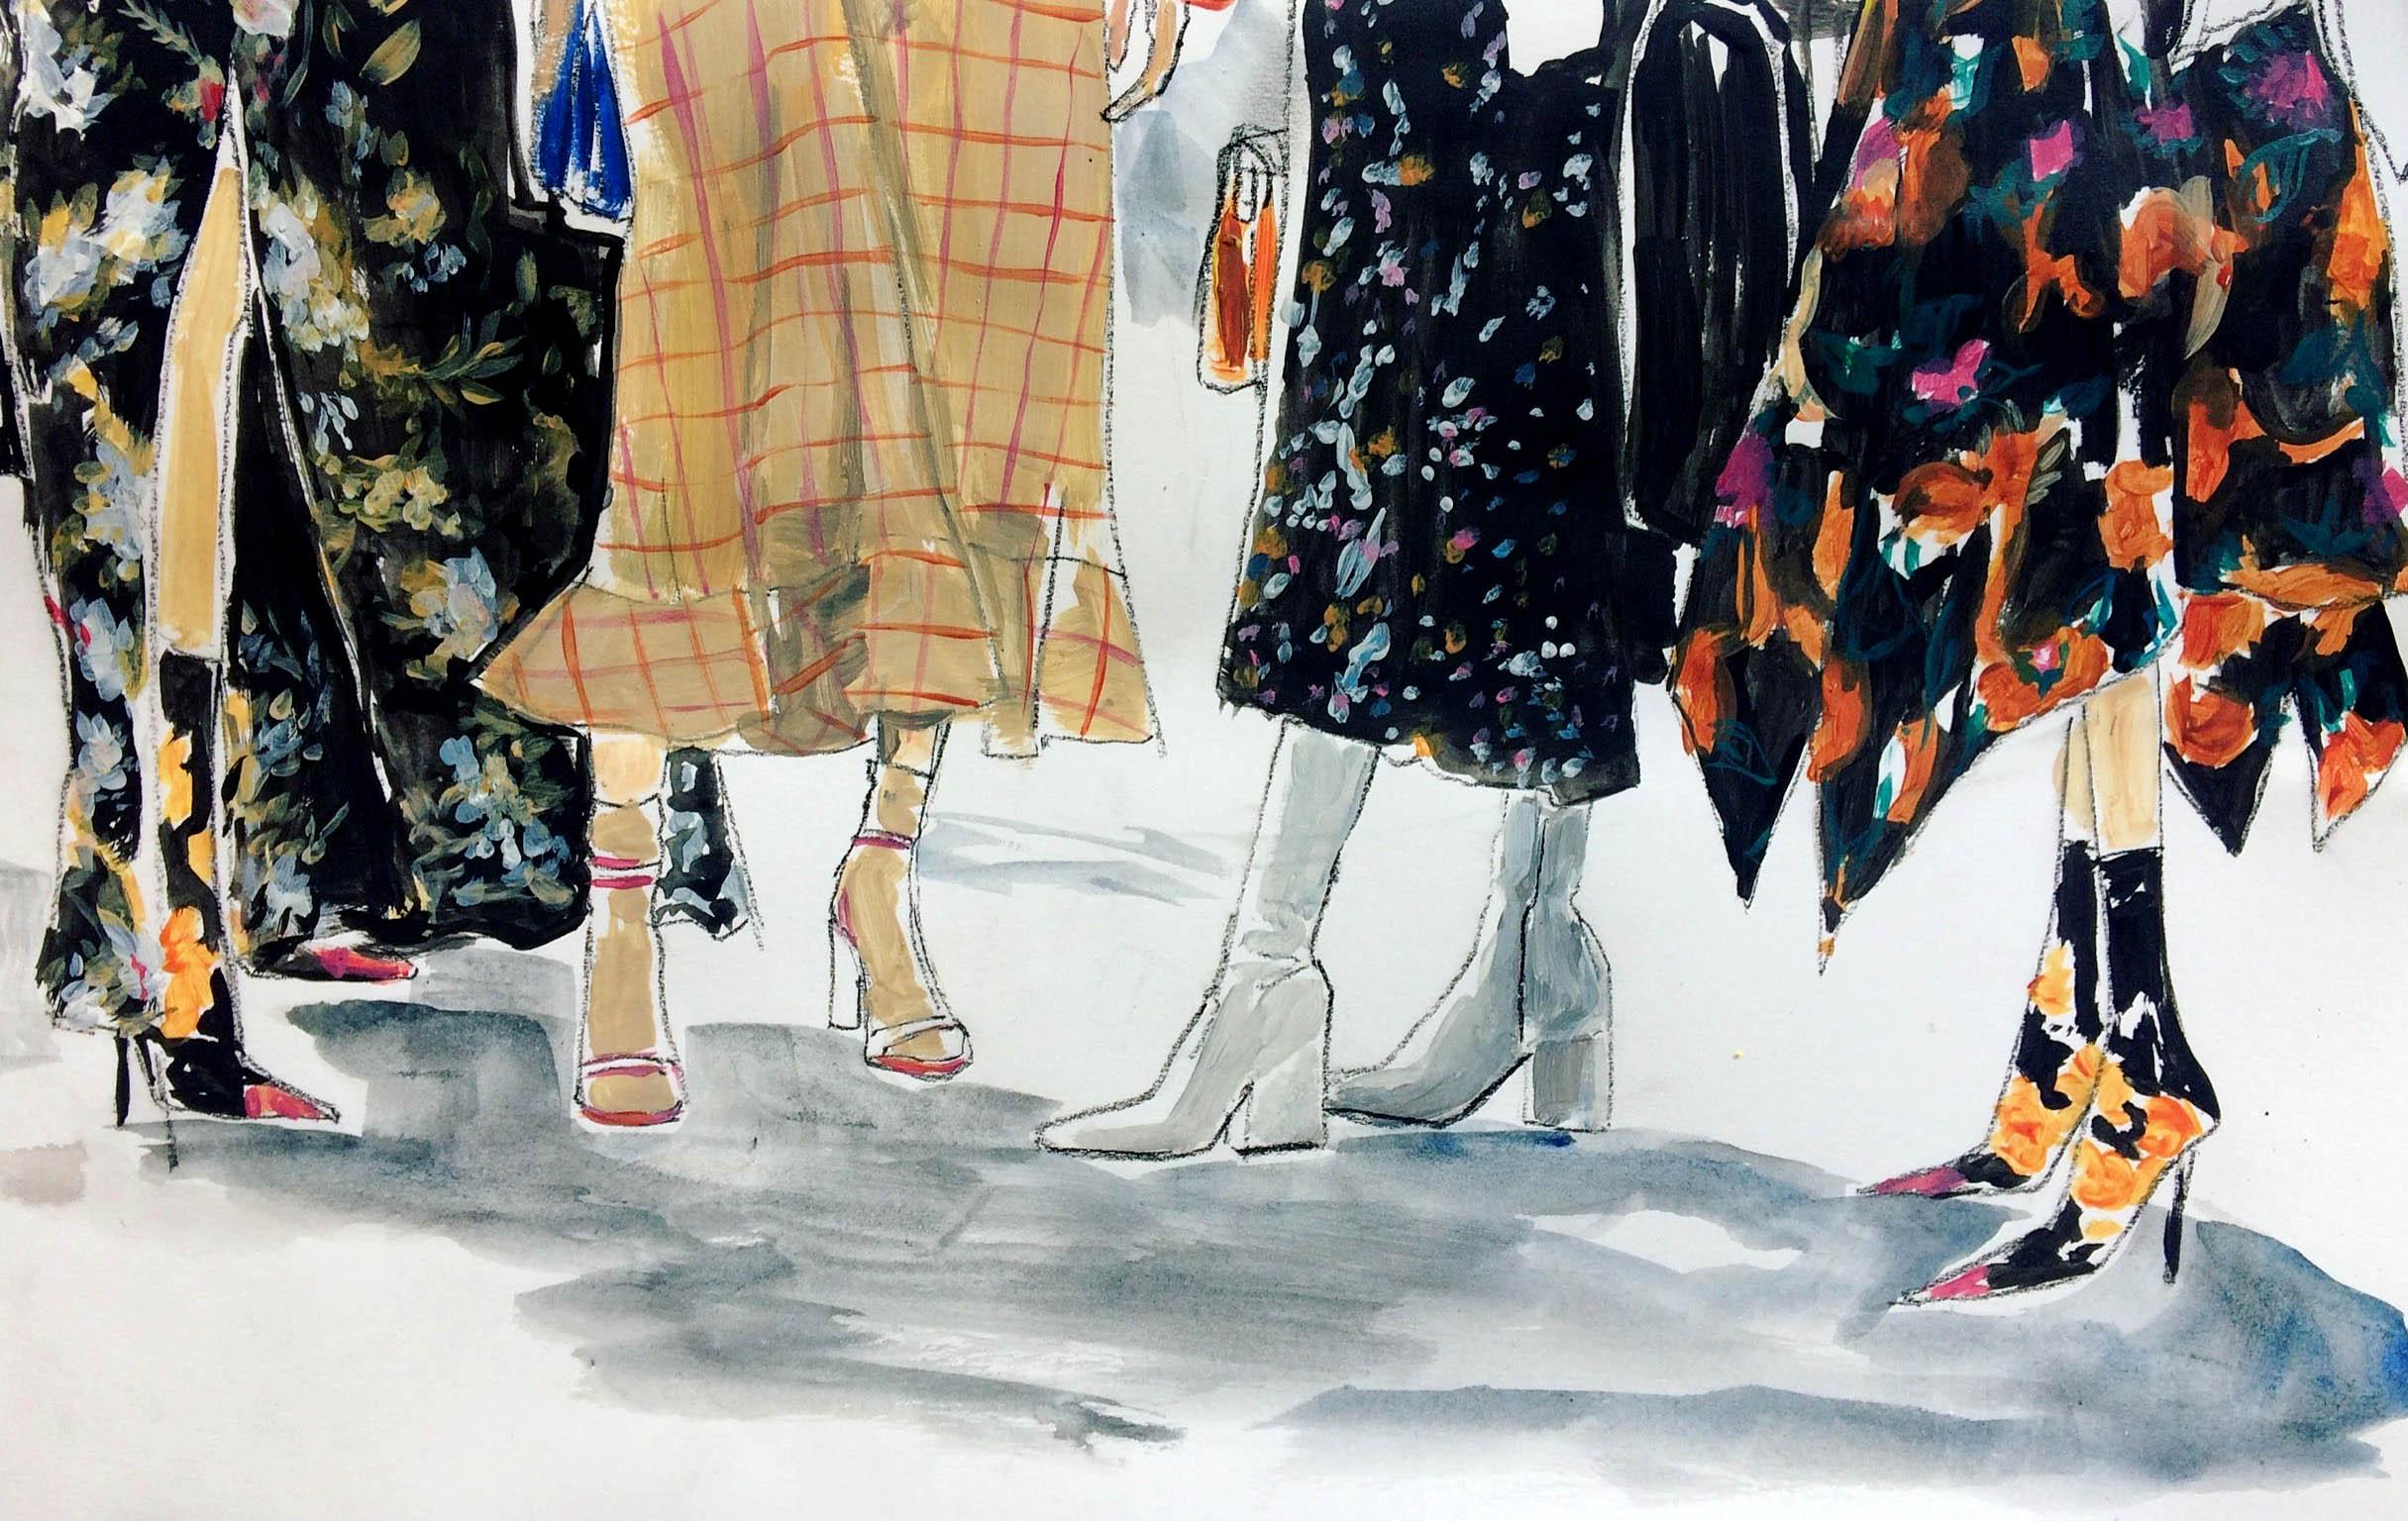 copenhagen fashion week illustration - selfish wardrobe.jpg